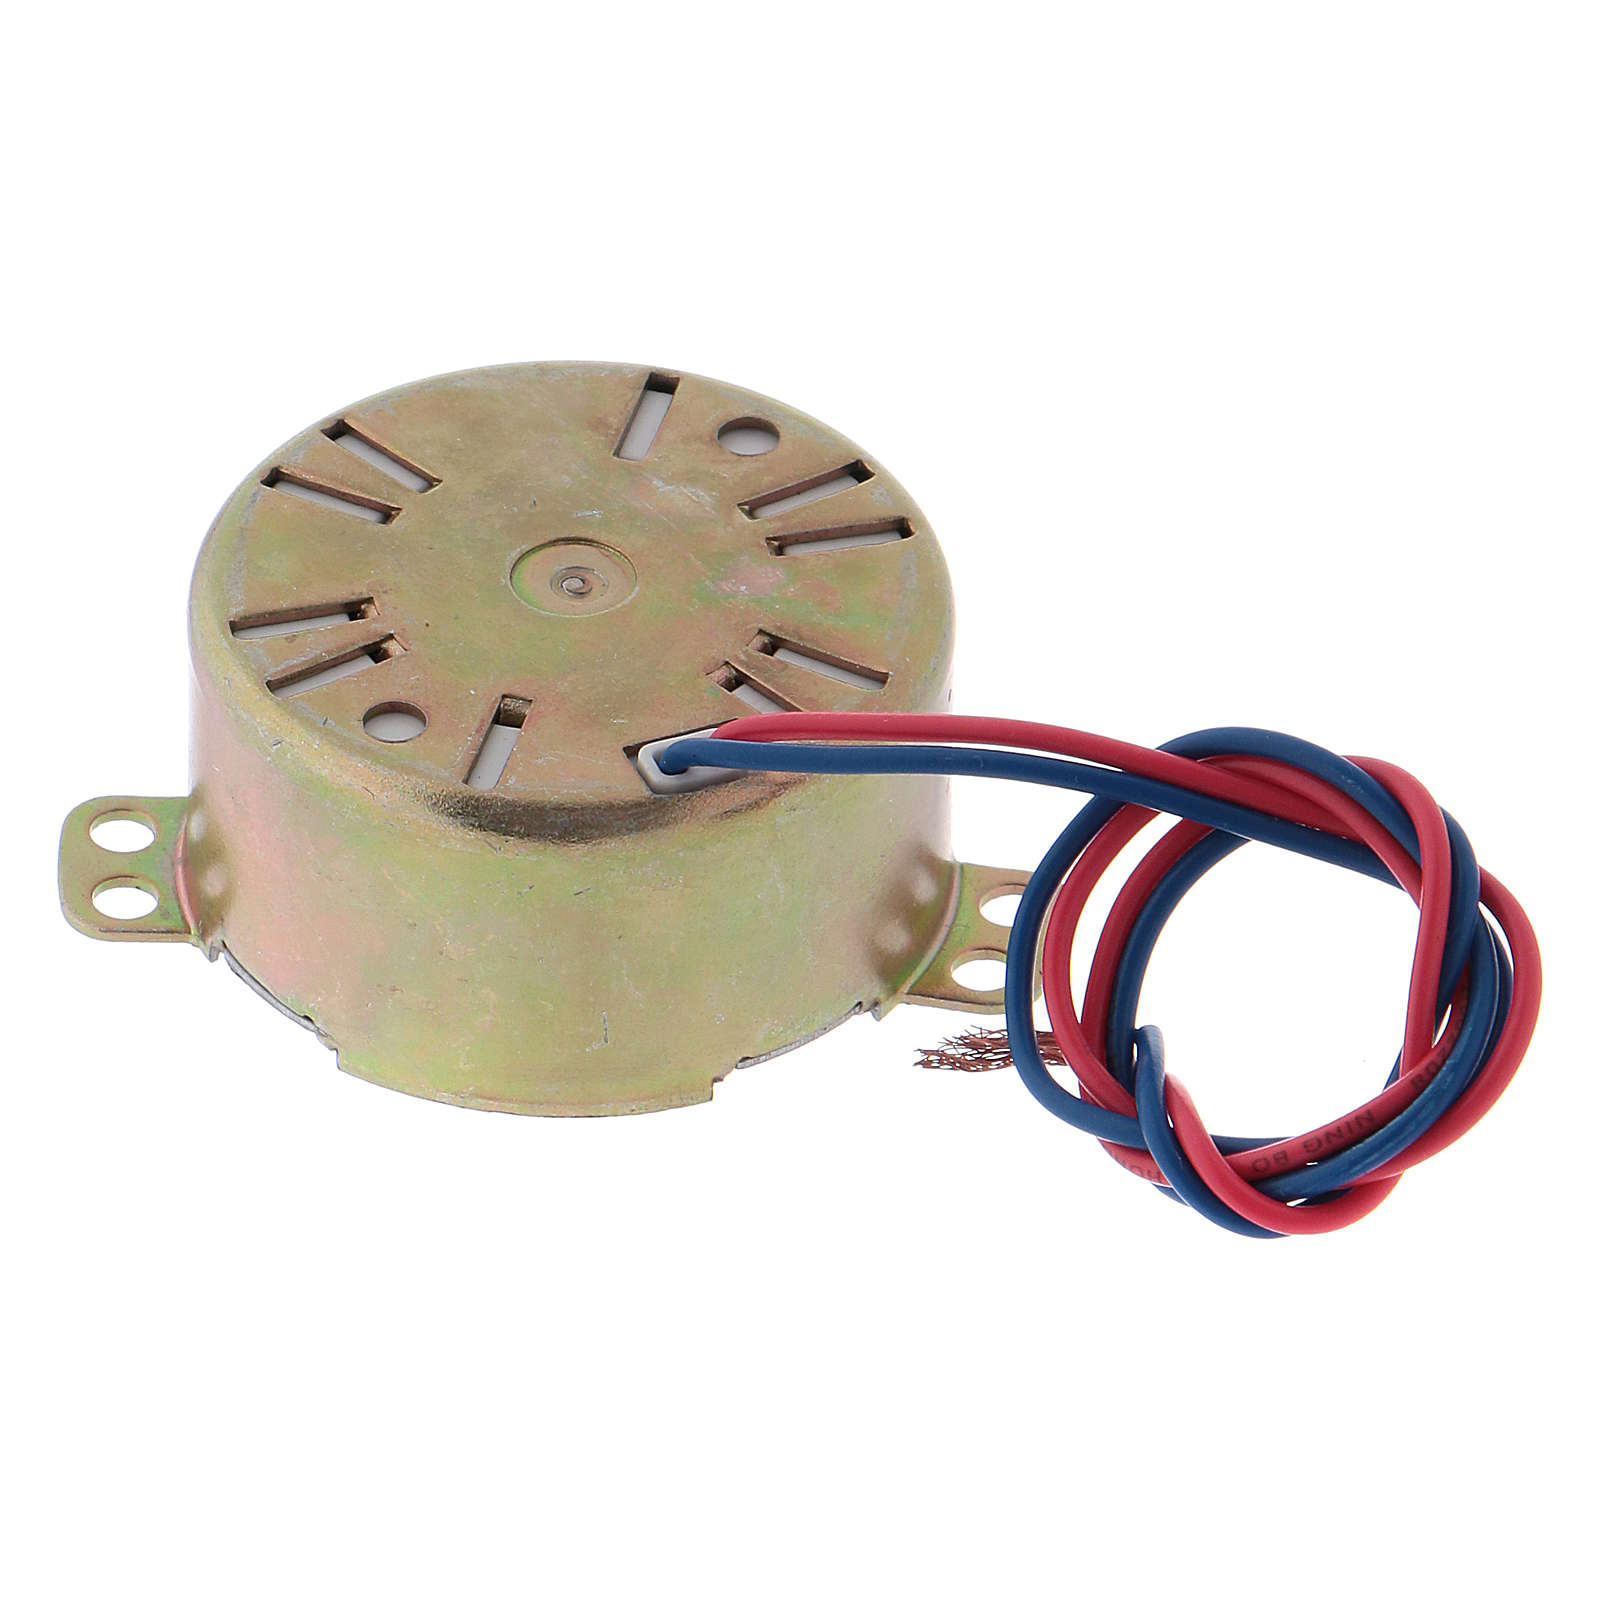 Nativity accessory, ME gear motor, 30 t/m 4